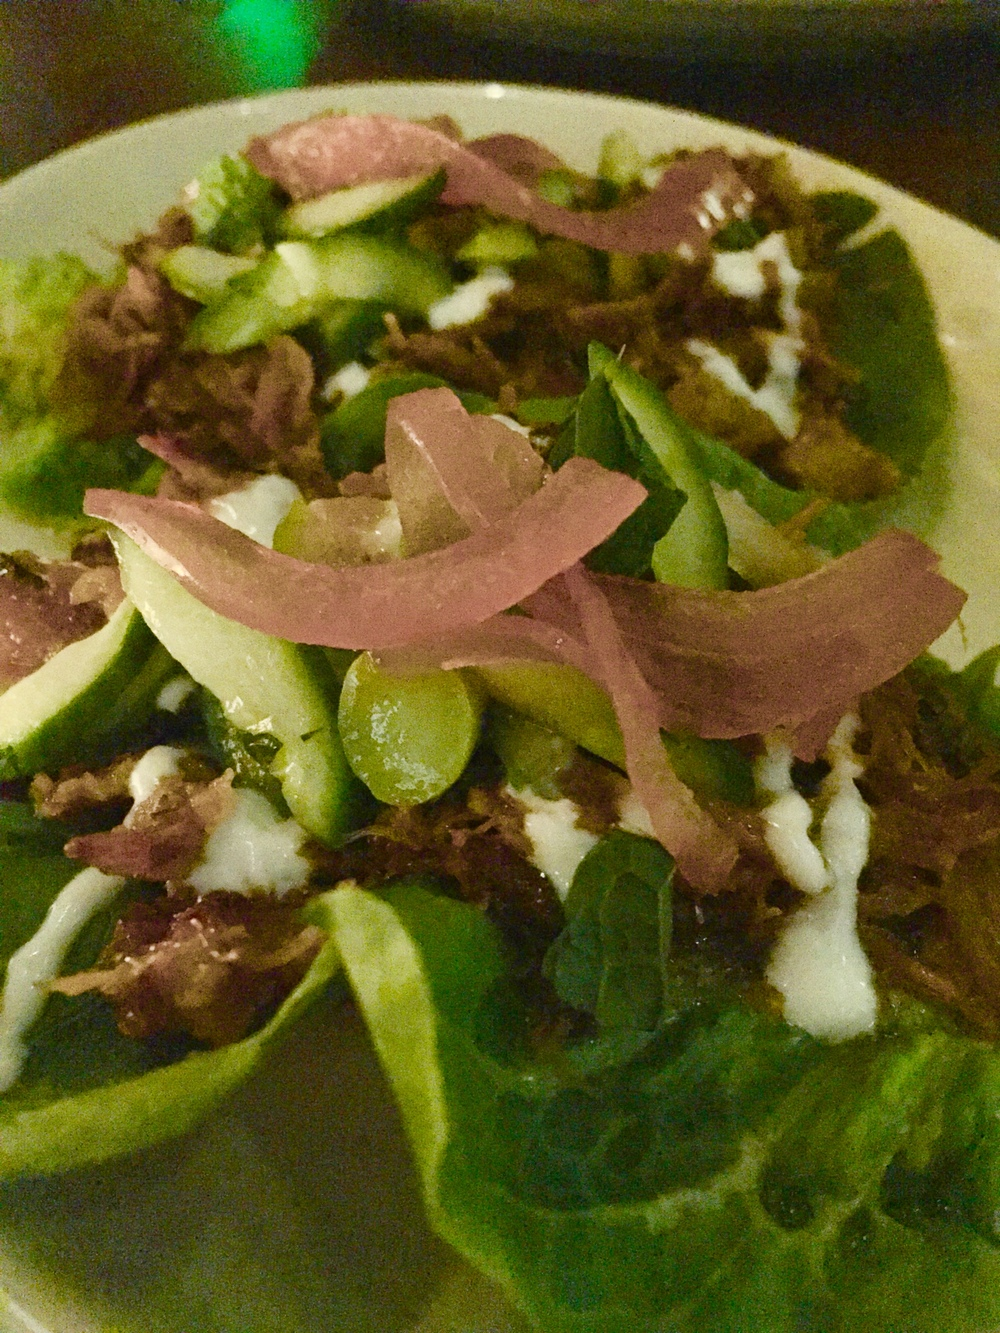 Lamb lettuce wrap nightly special.